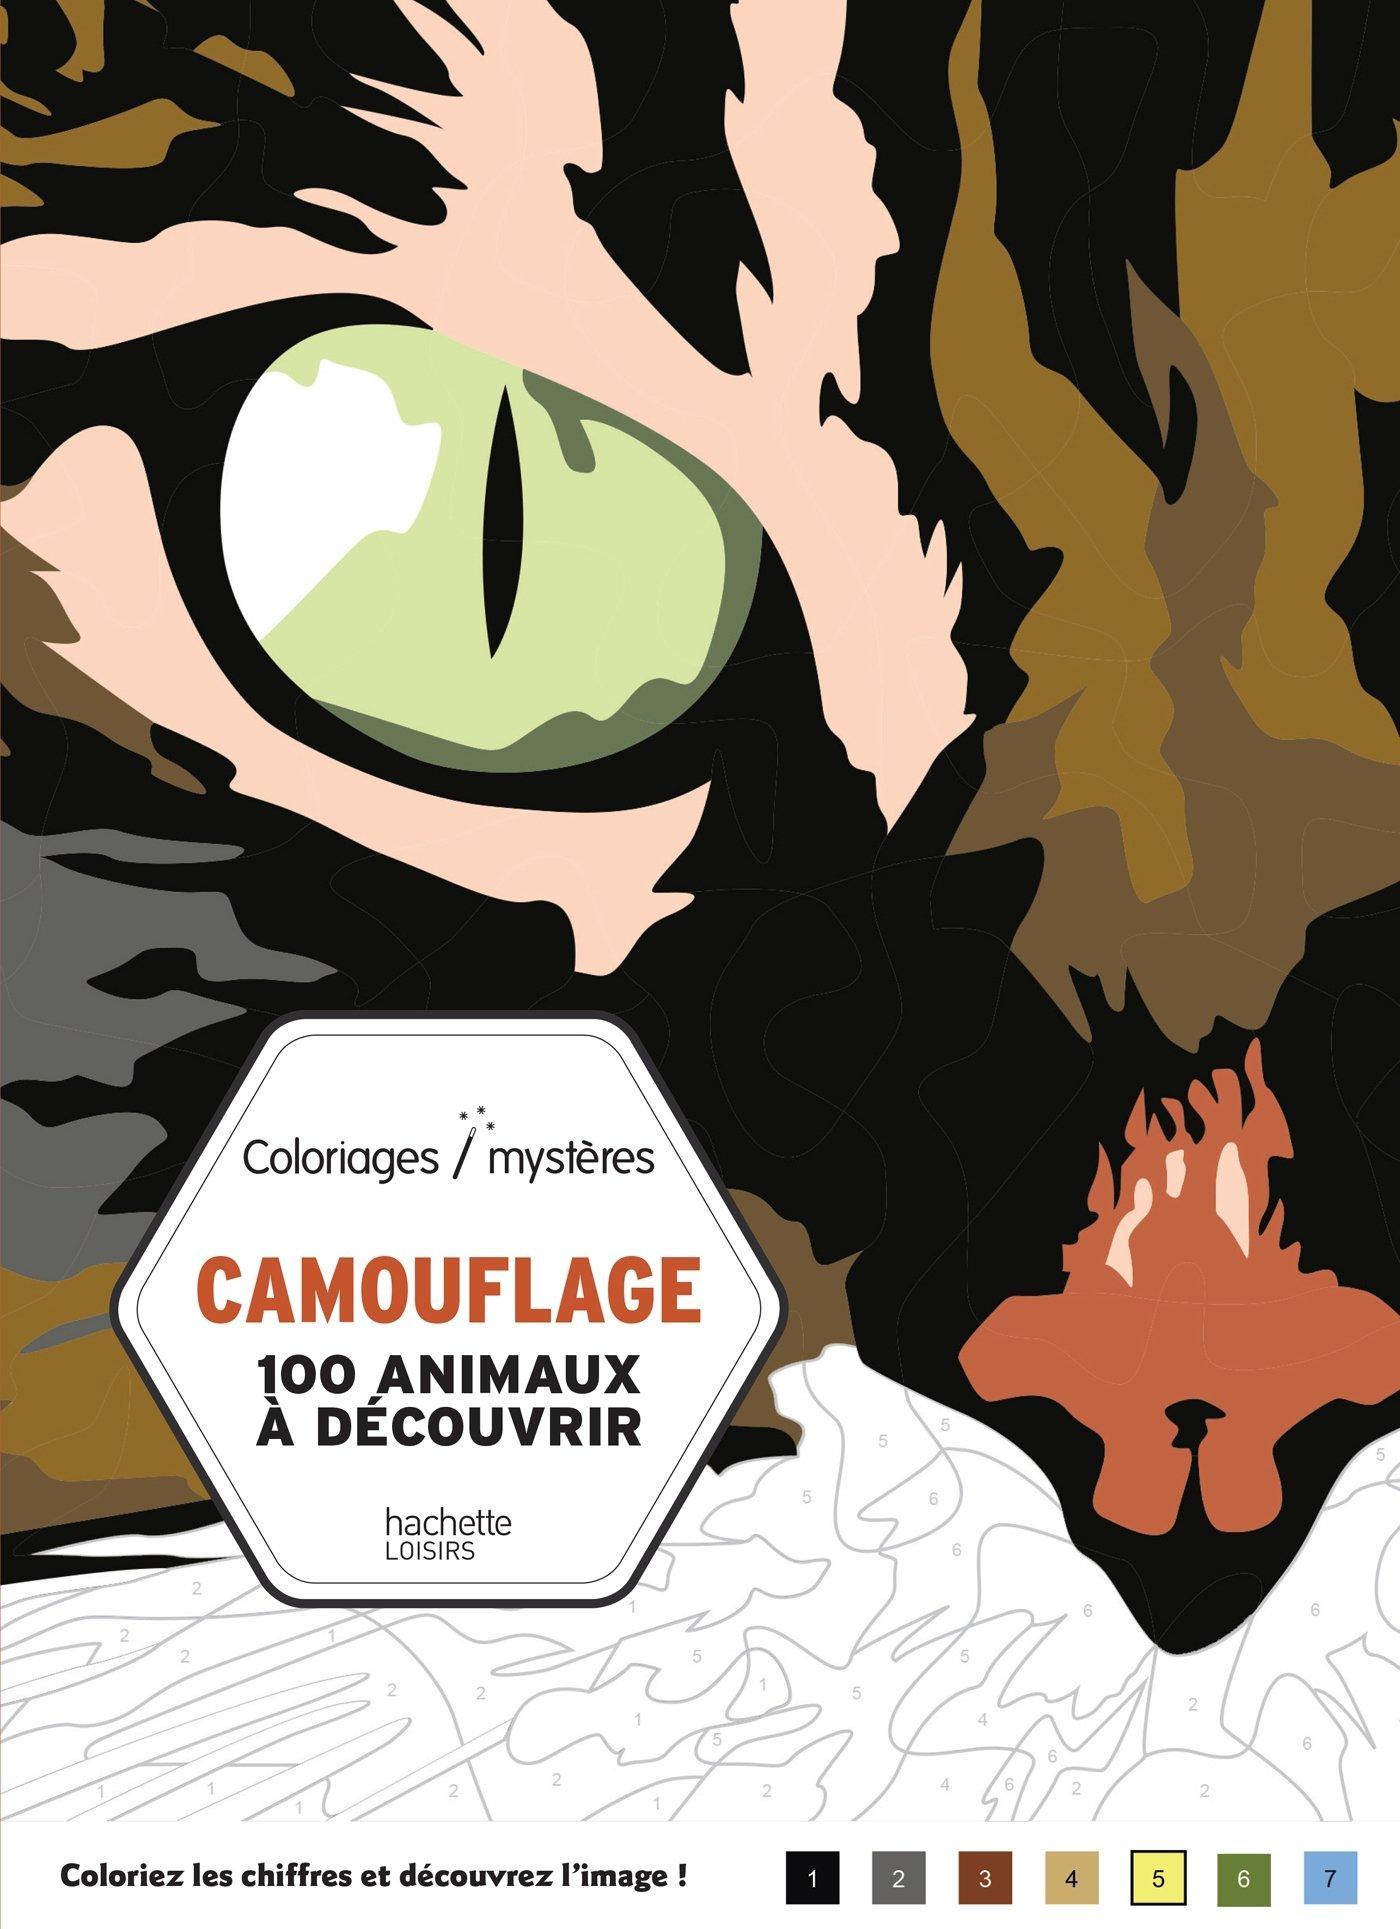 Camouflage 100 animaux  découvrir